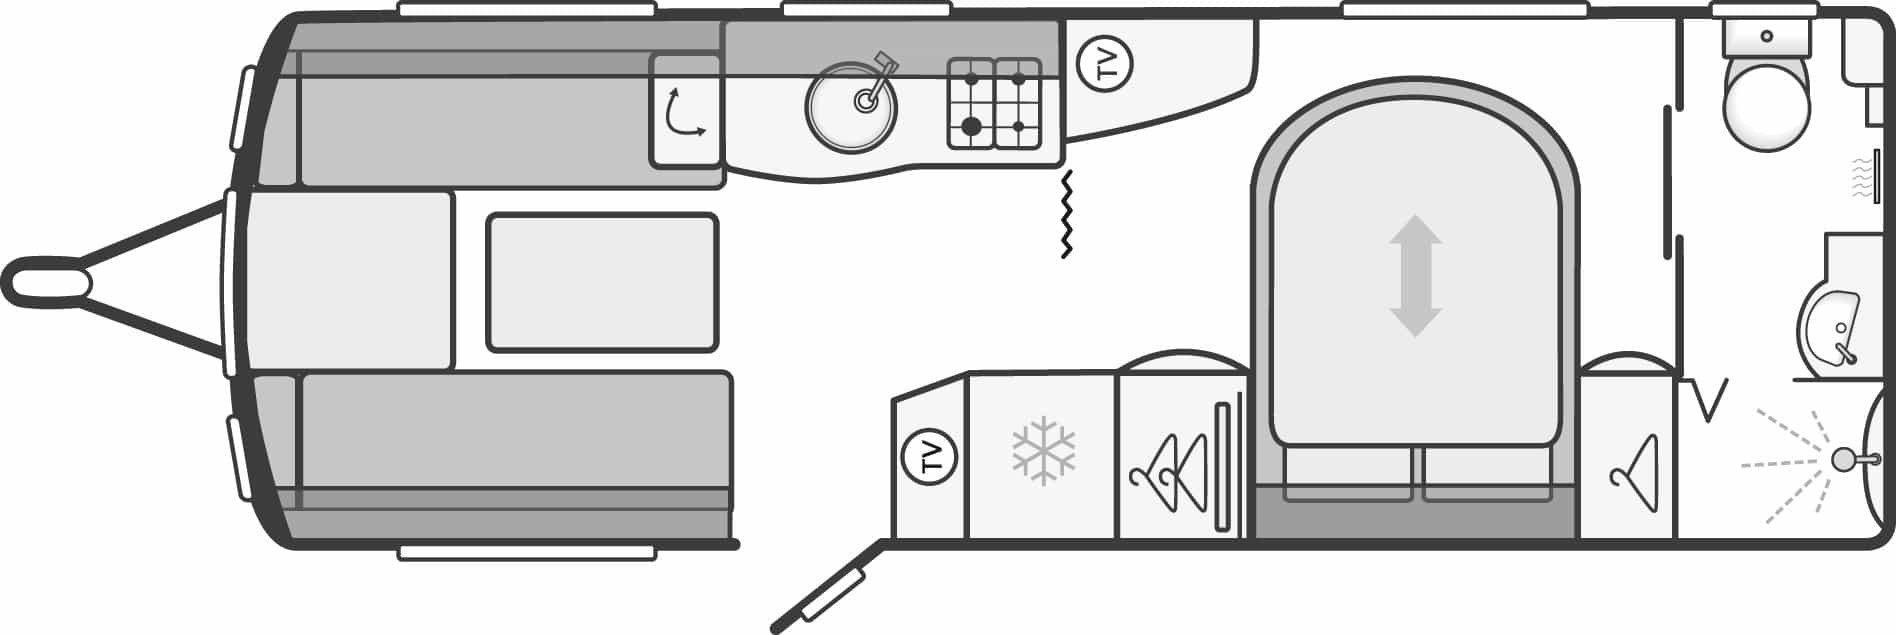 Conqueror 645 - 4 Berth, Twin Axle, Transverse Fixed Bed, End Washroom